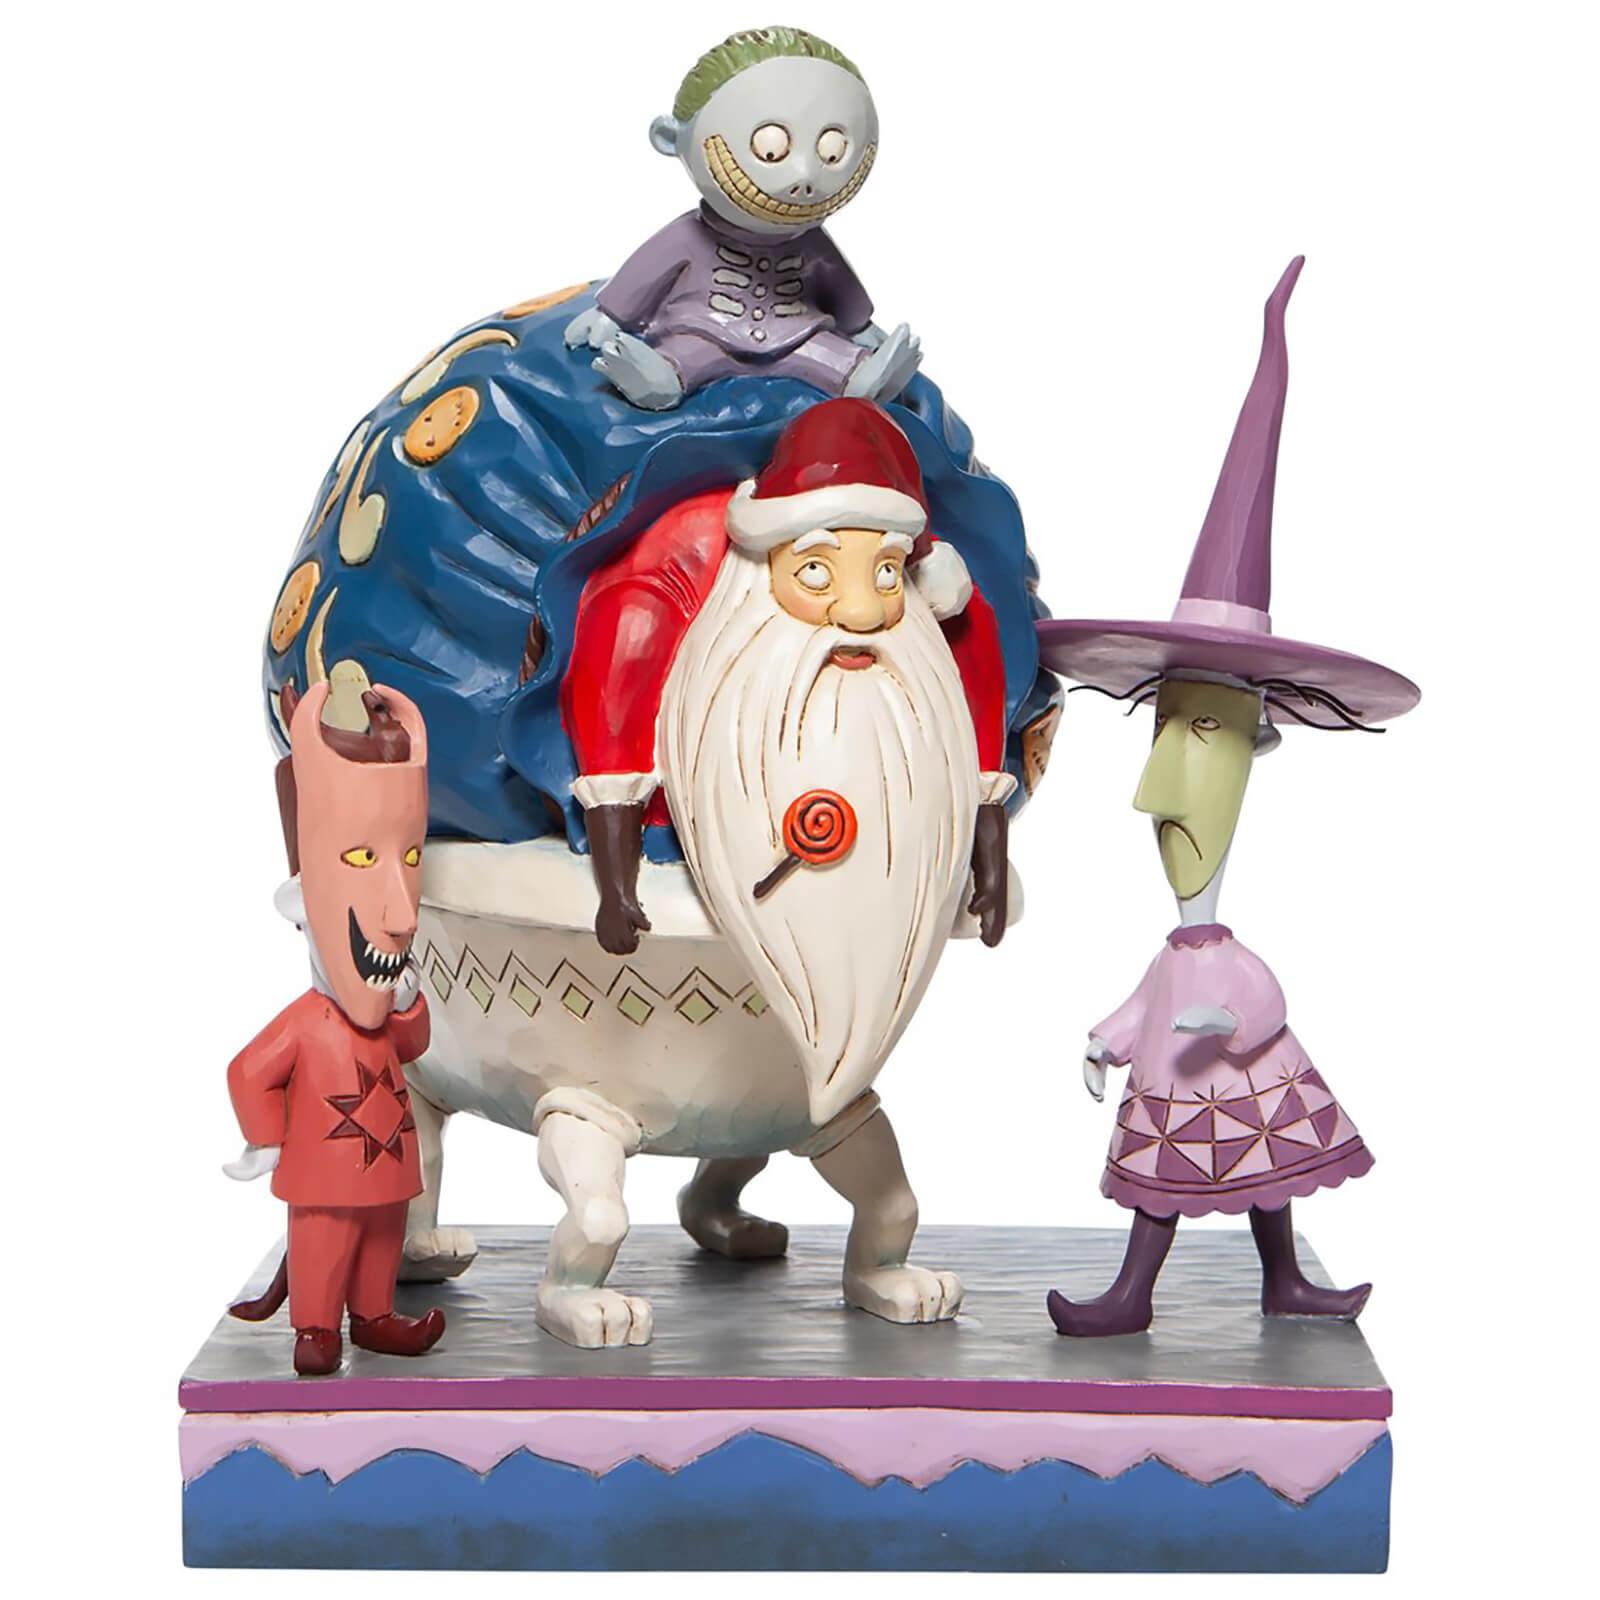 Disney Traditions Lock, Shock and Barrel with Santa Figurine 23cm